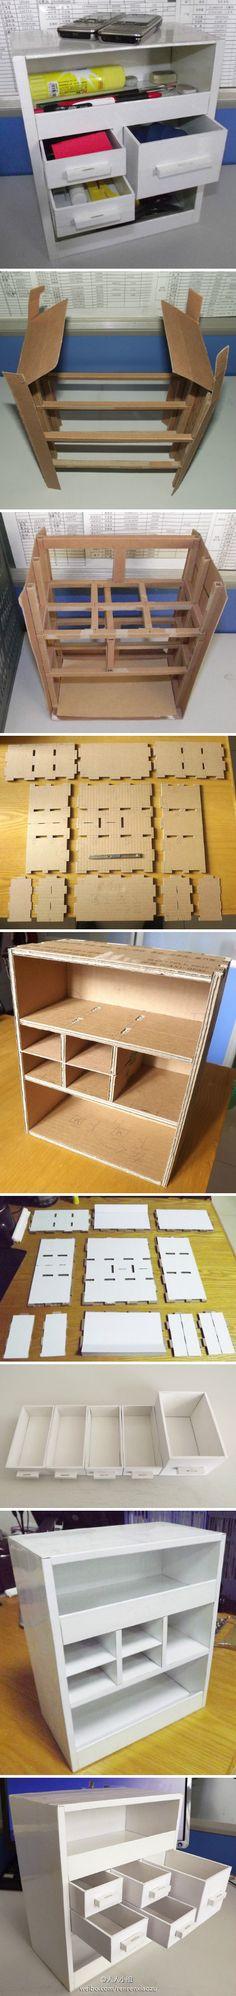 Cardboard box cupboard